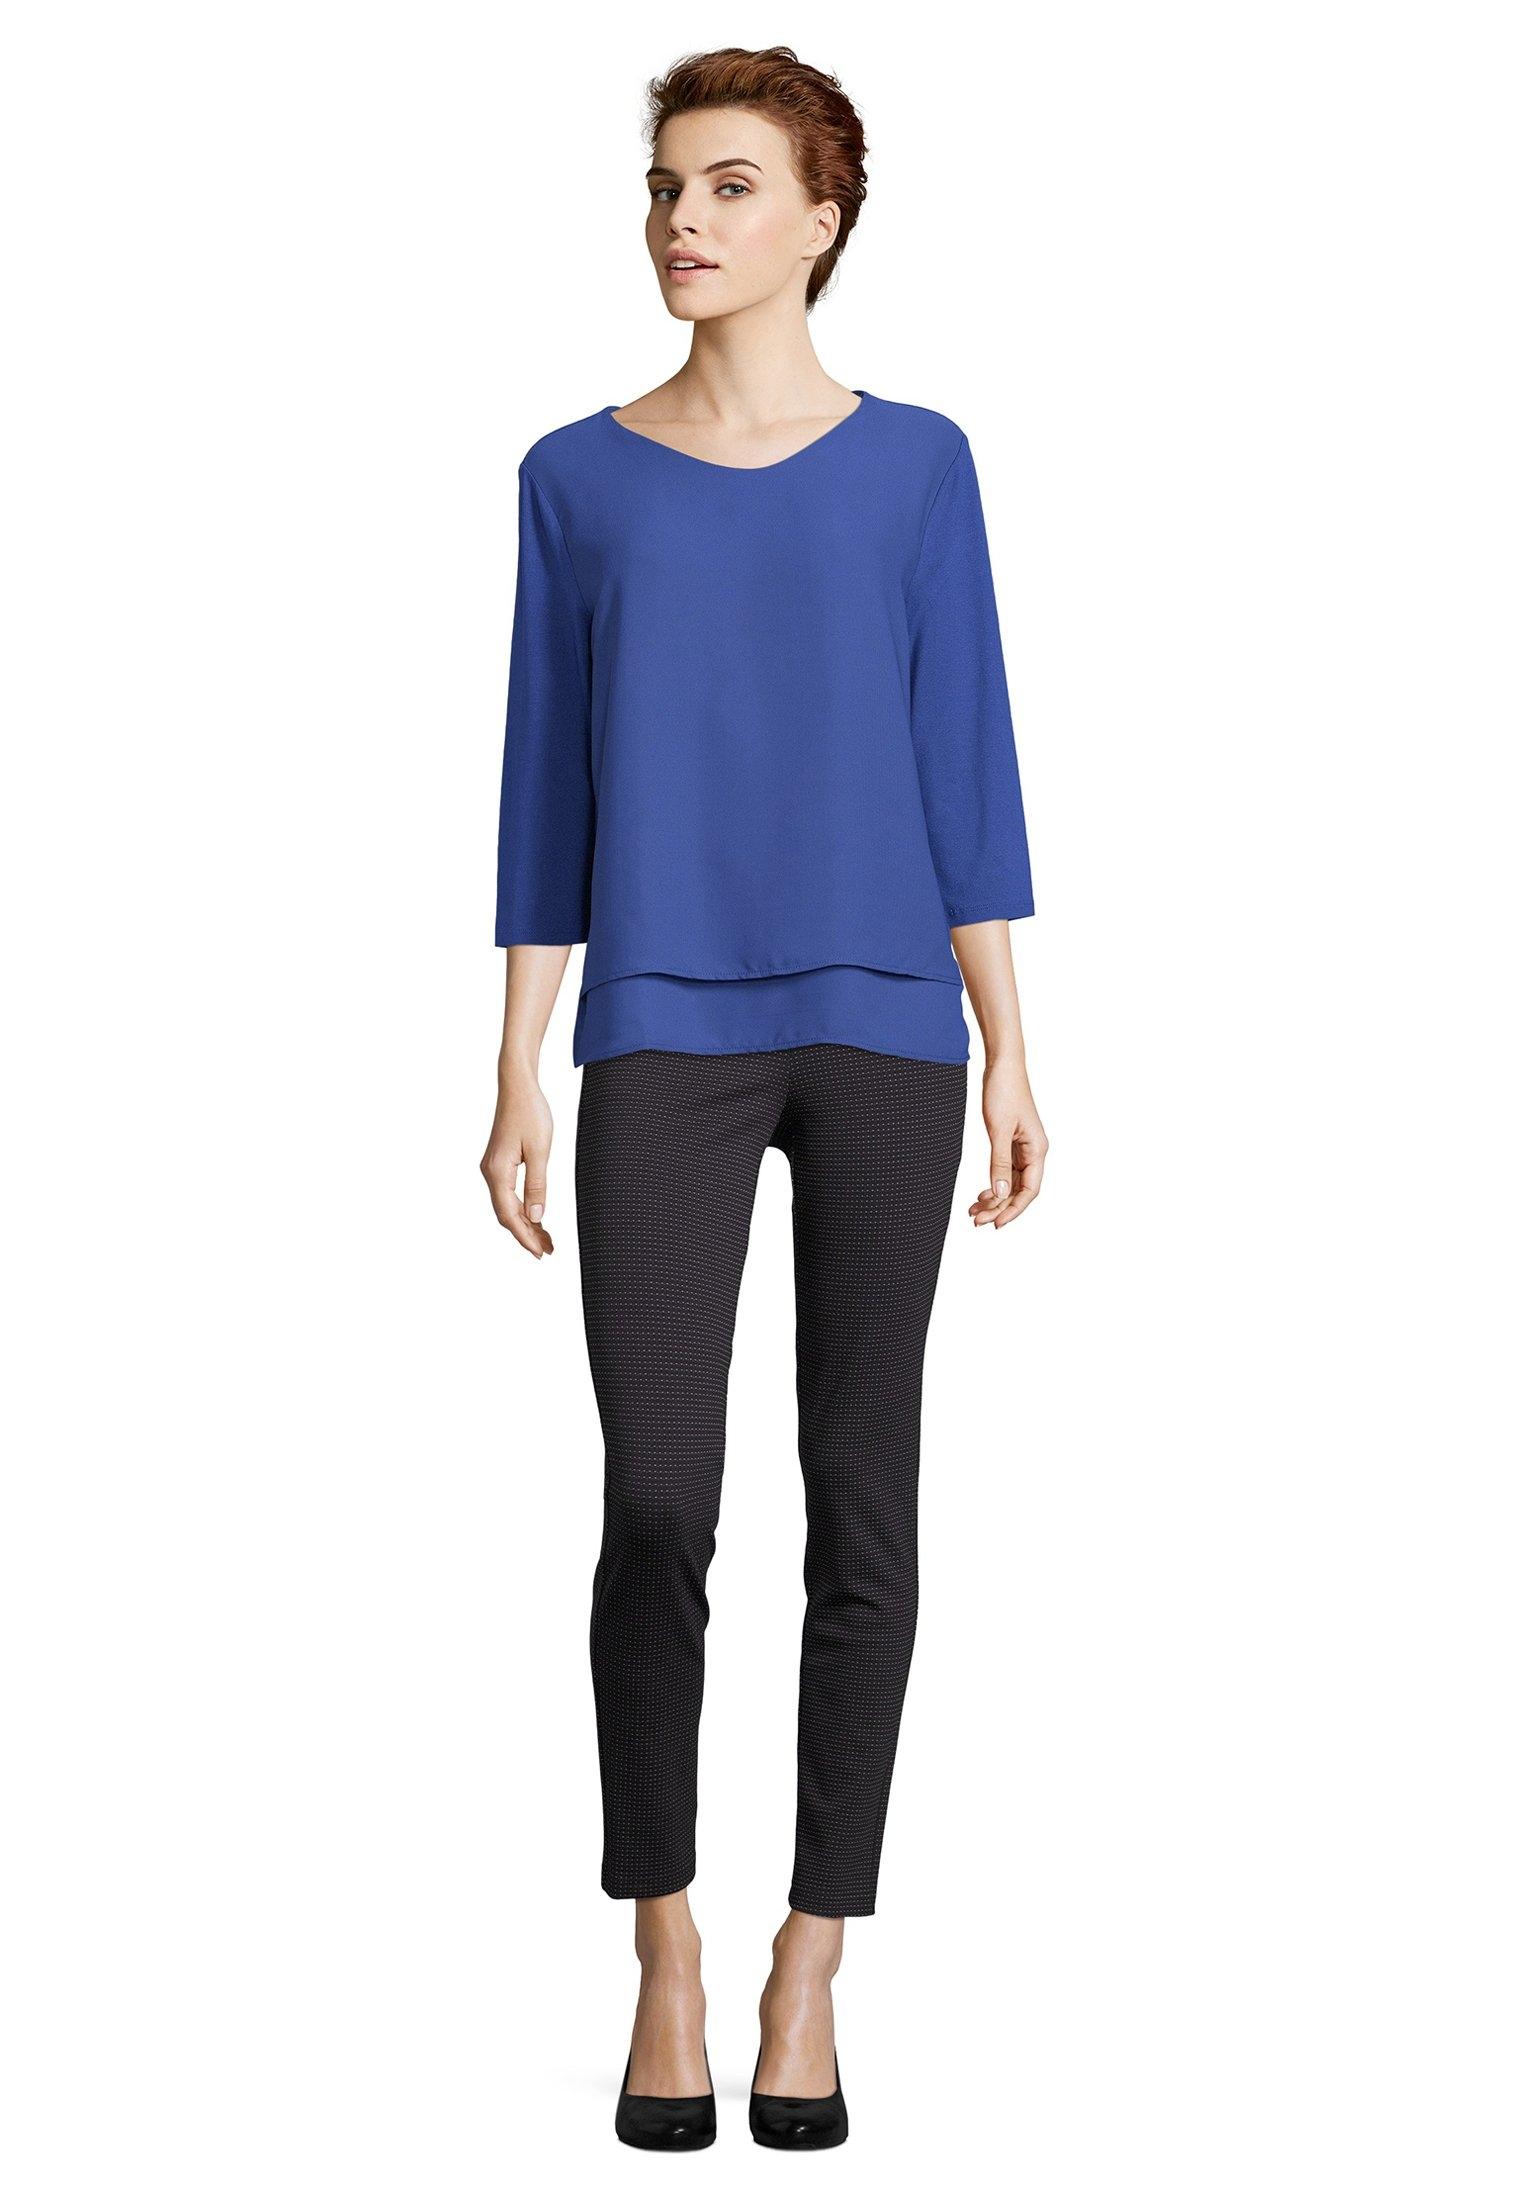 Betty Barclay Shirt in blousestijl nu online bestellen